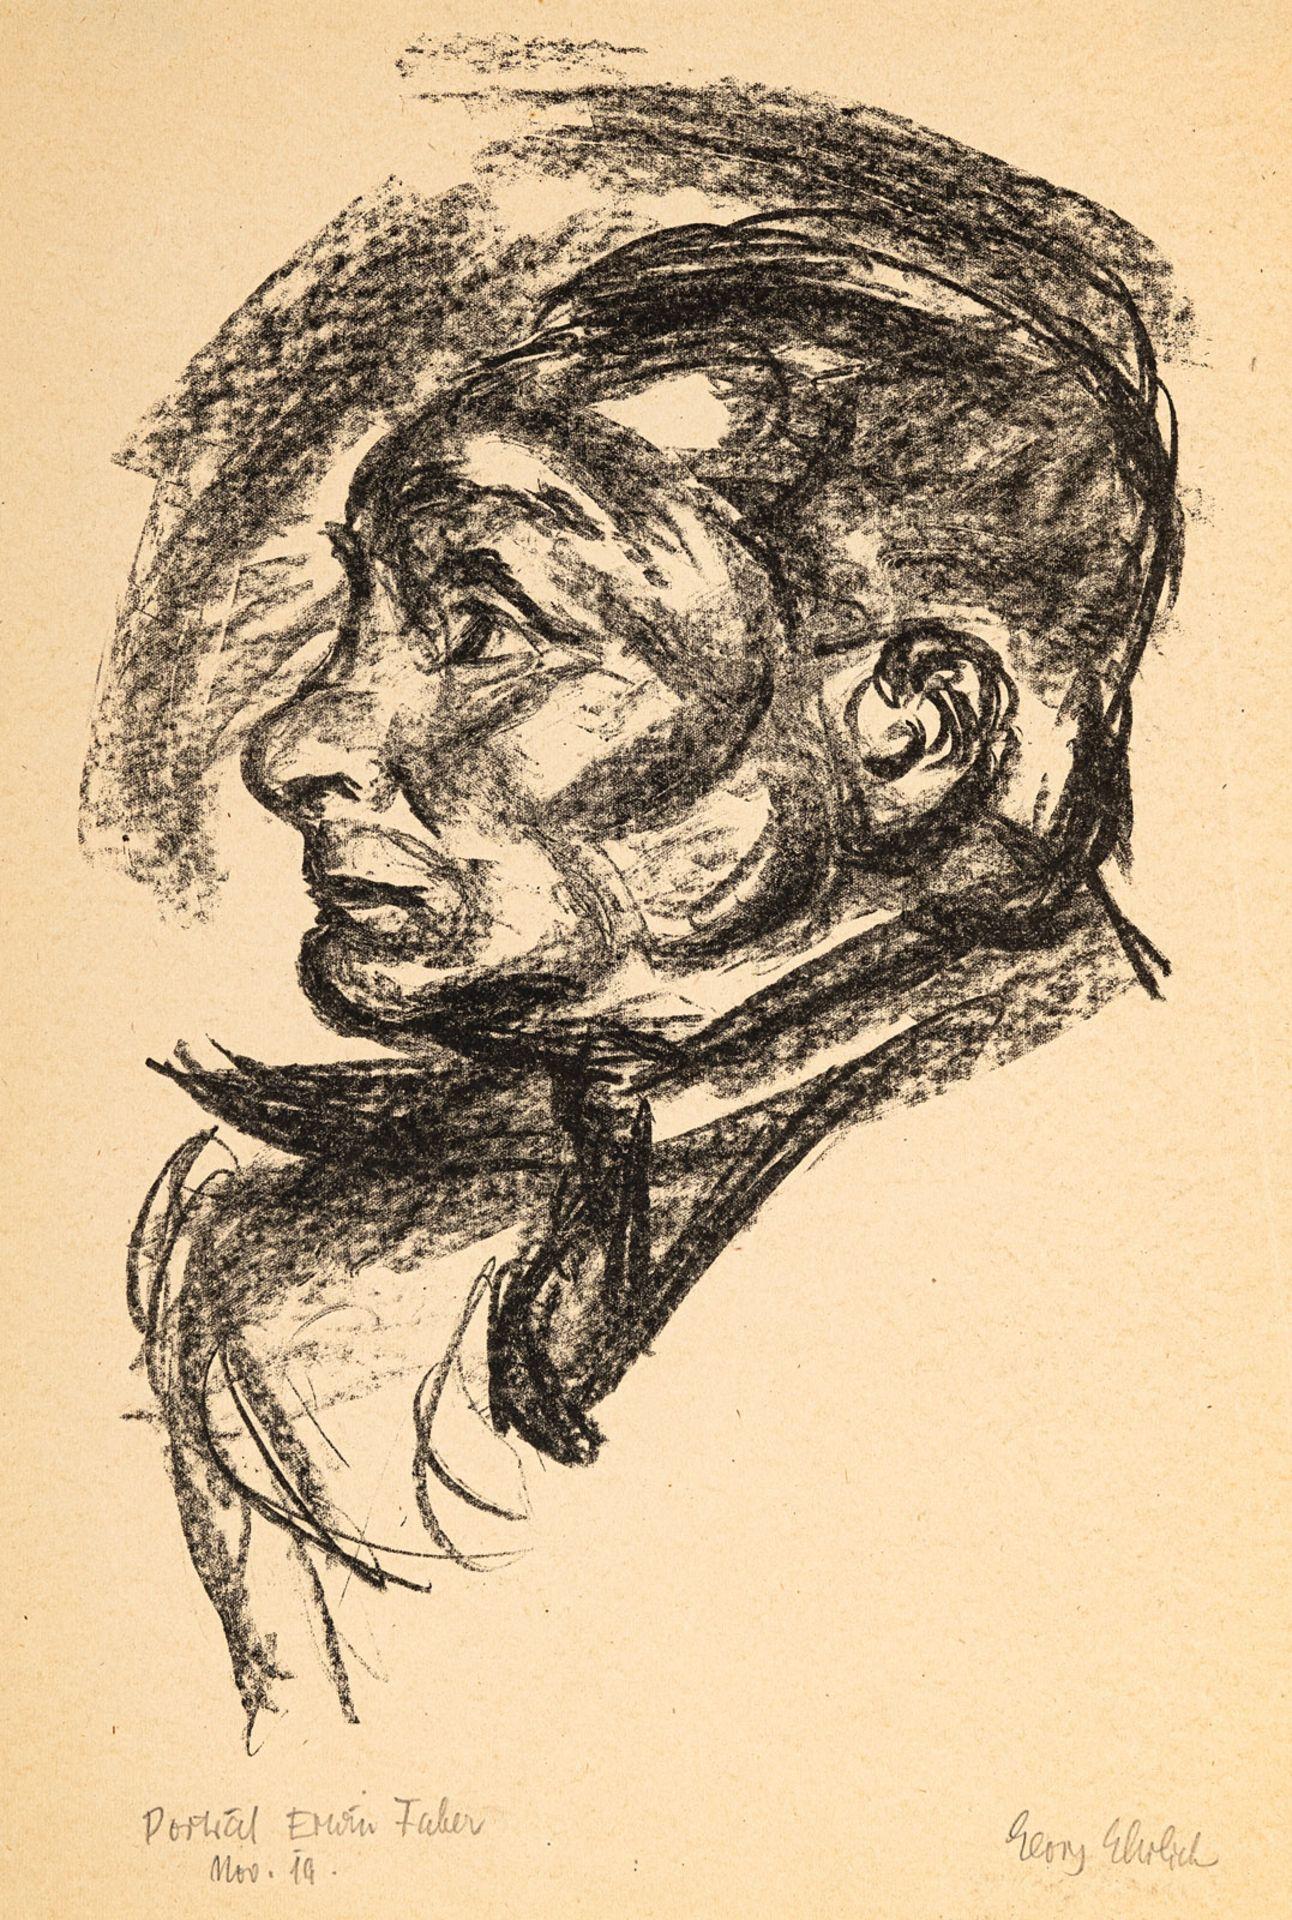 Ehrlich, Georg - Image 2 of 6